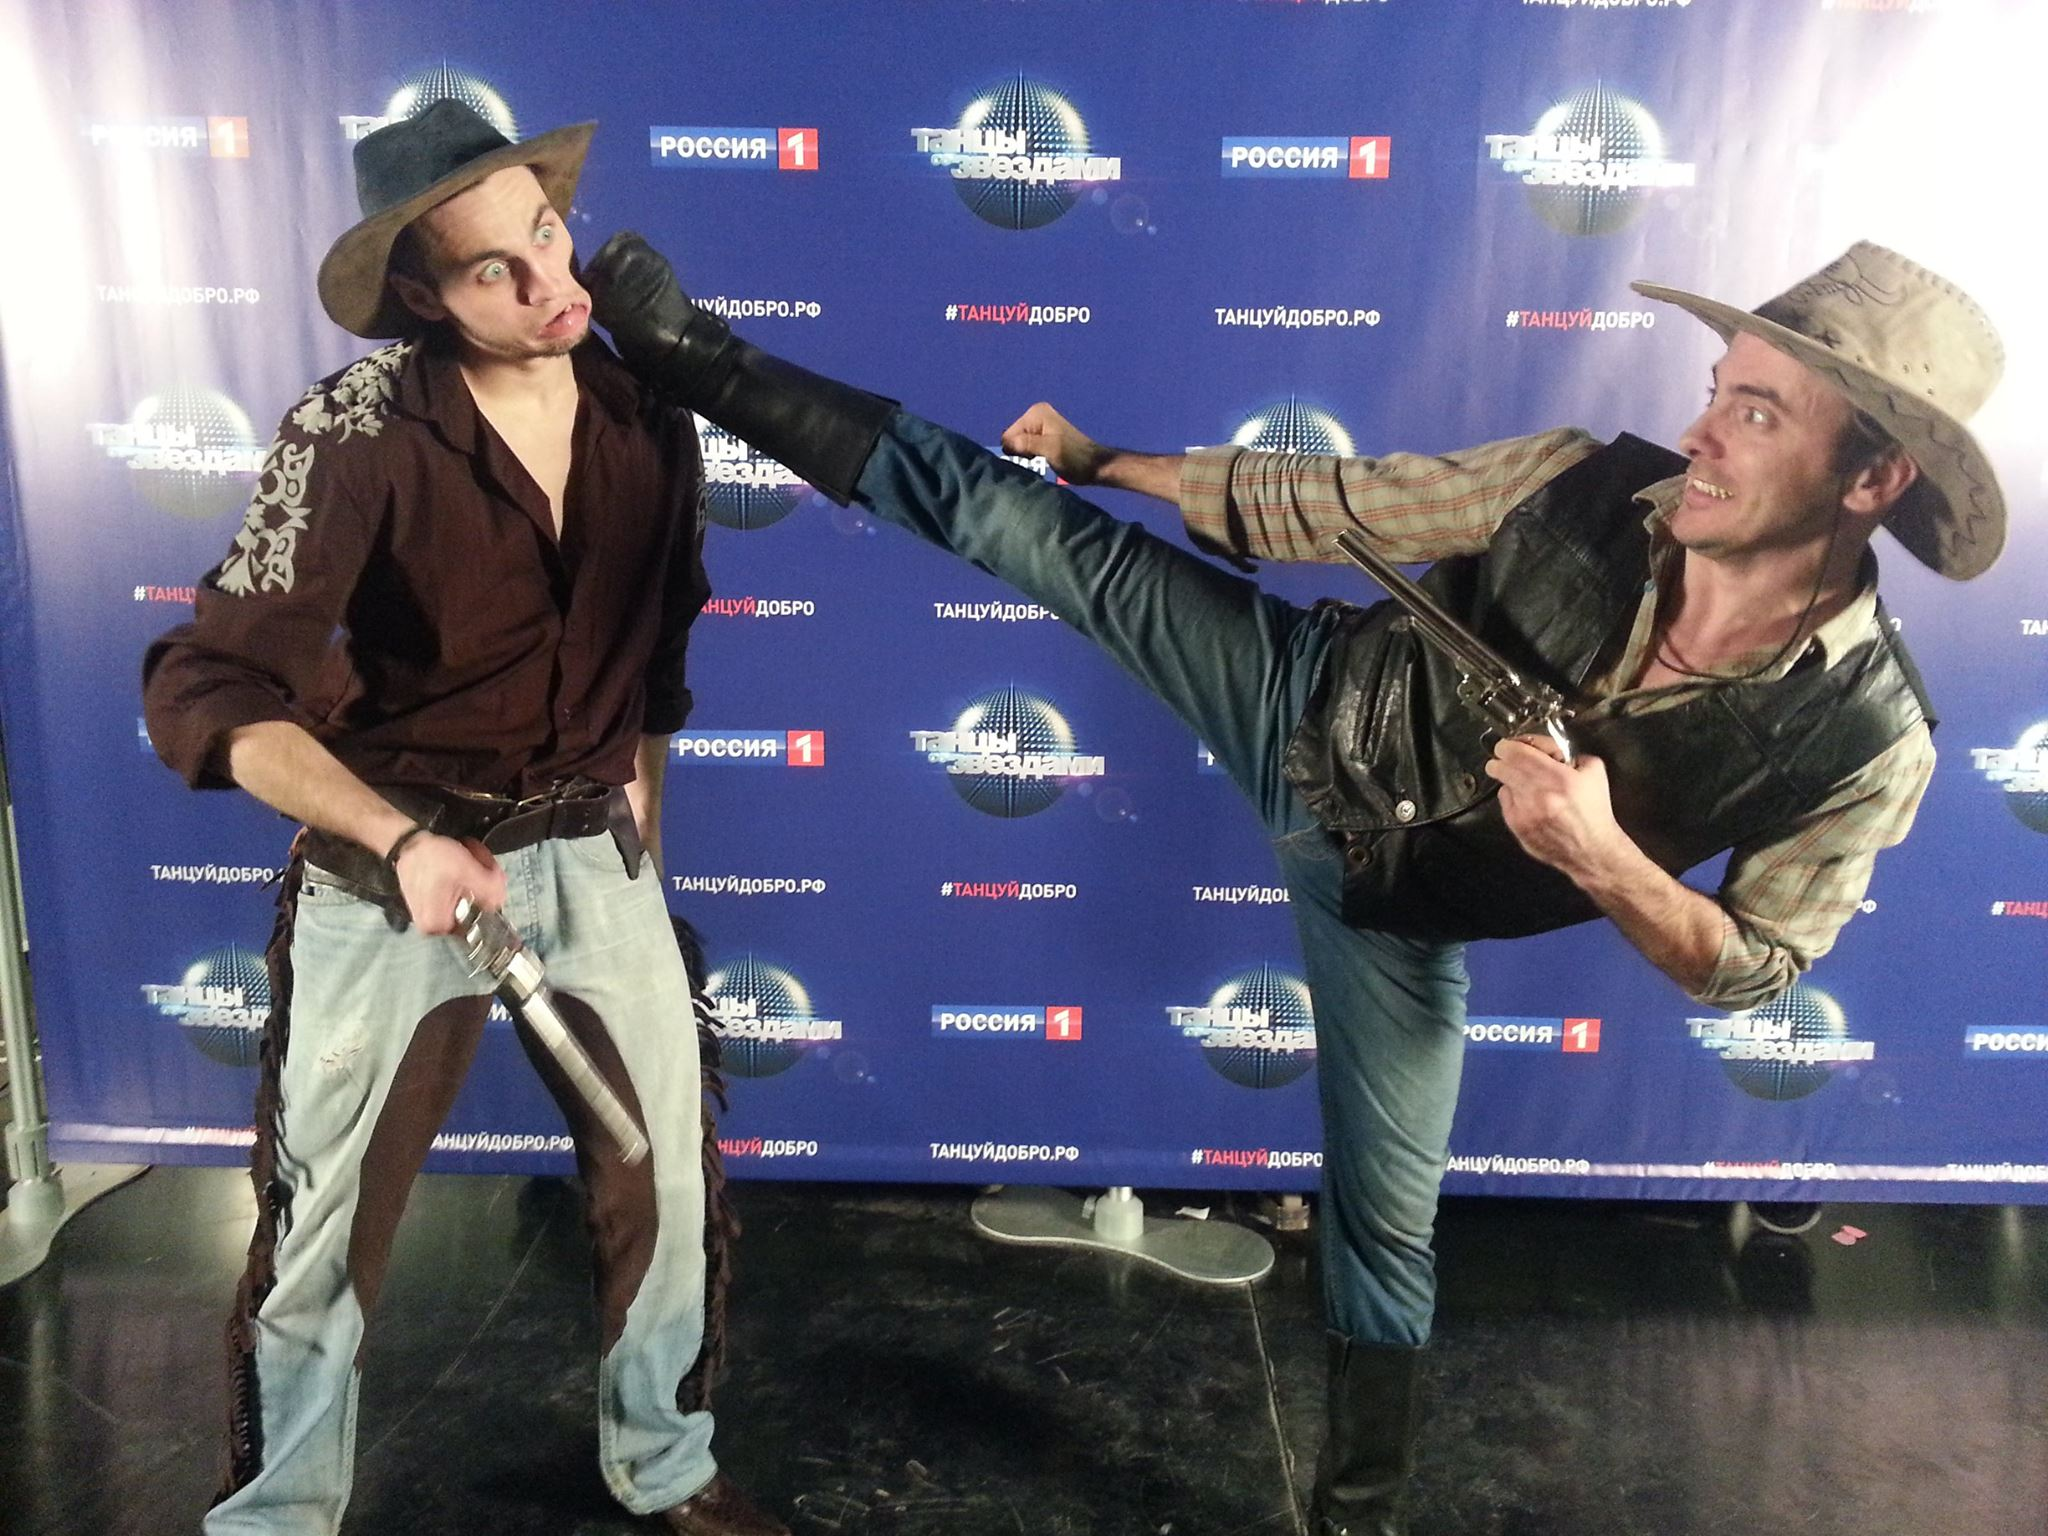 Русская команда каскадёров Сергея Морина - Dragon Brothers (DB) 7